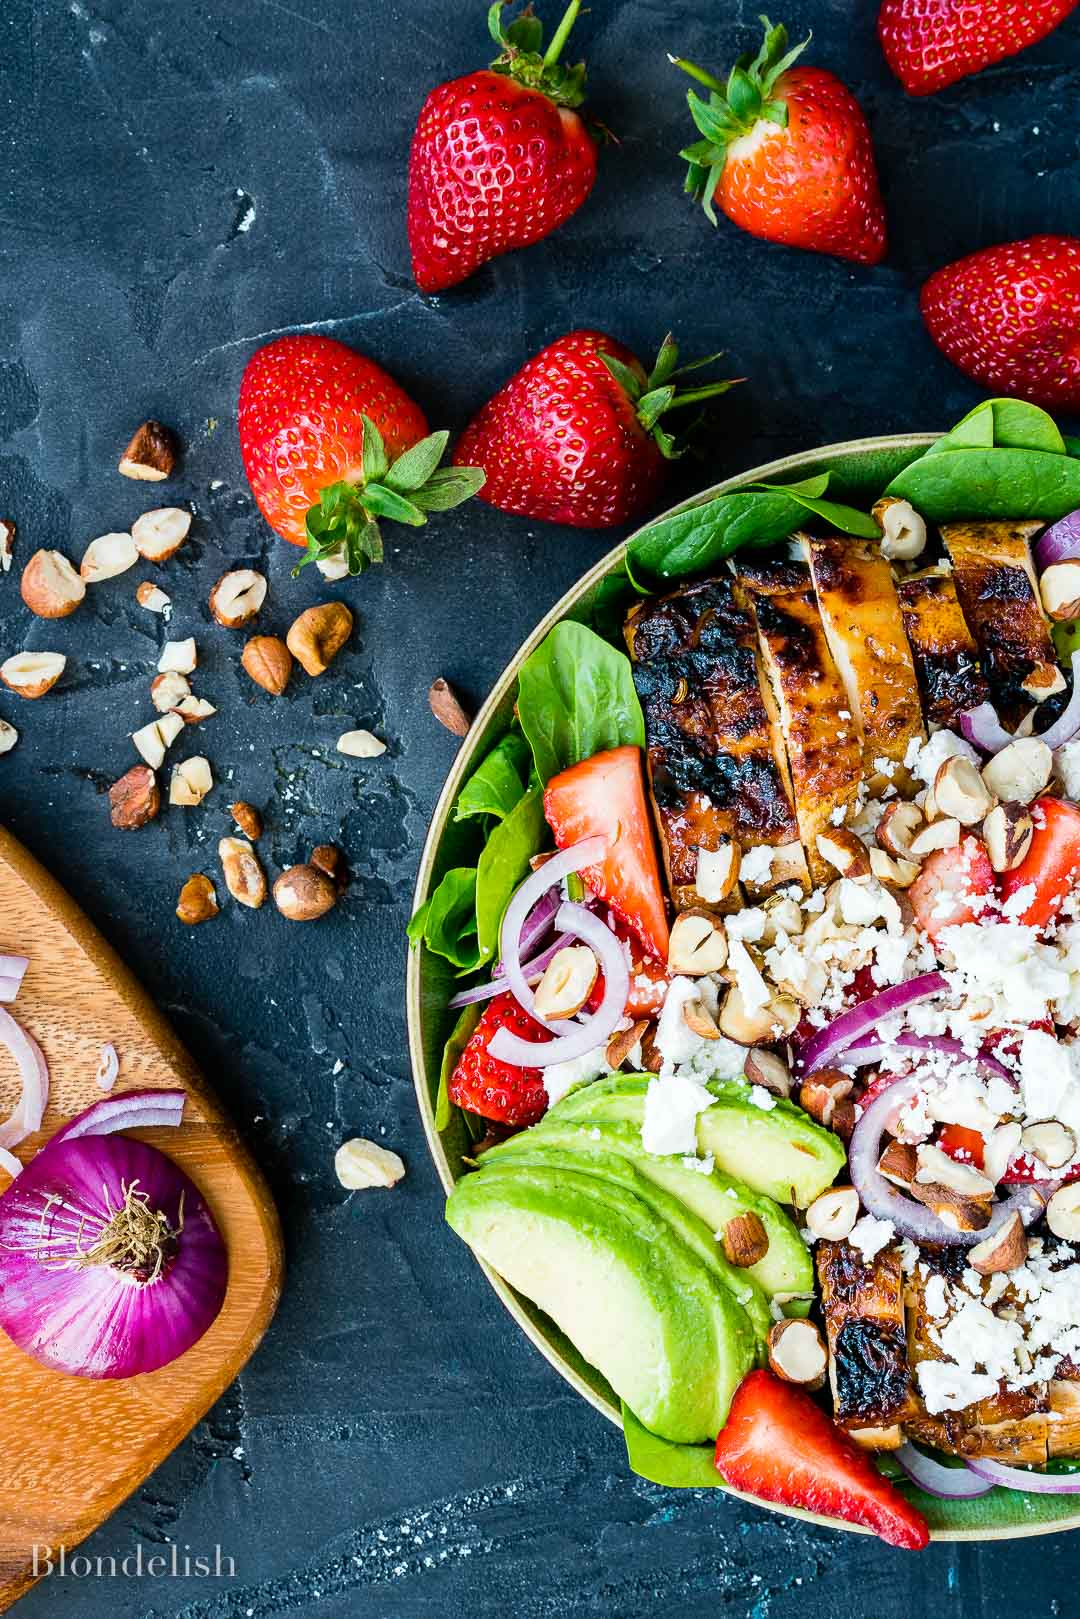 Best Strawberry and Avocado Chicken Salad Recipe 6 - How to make Chicken Salad